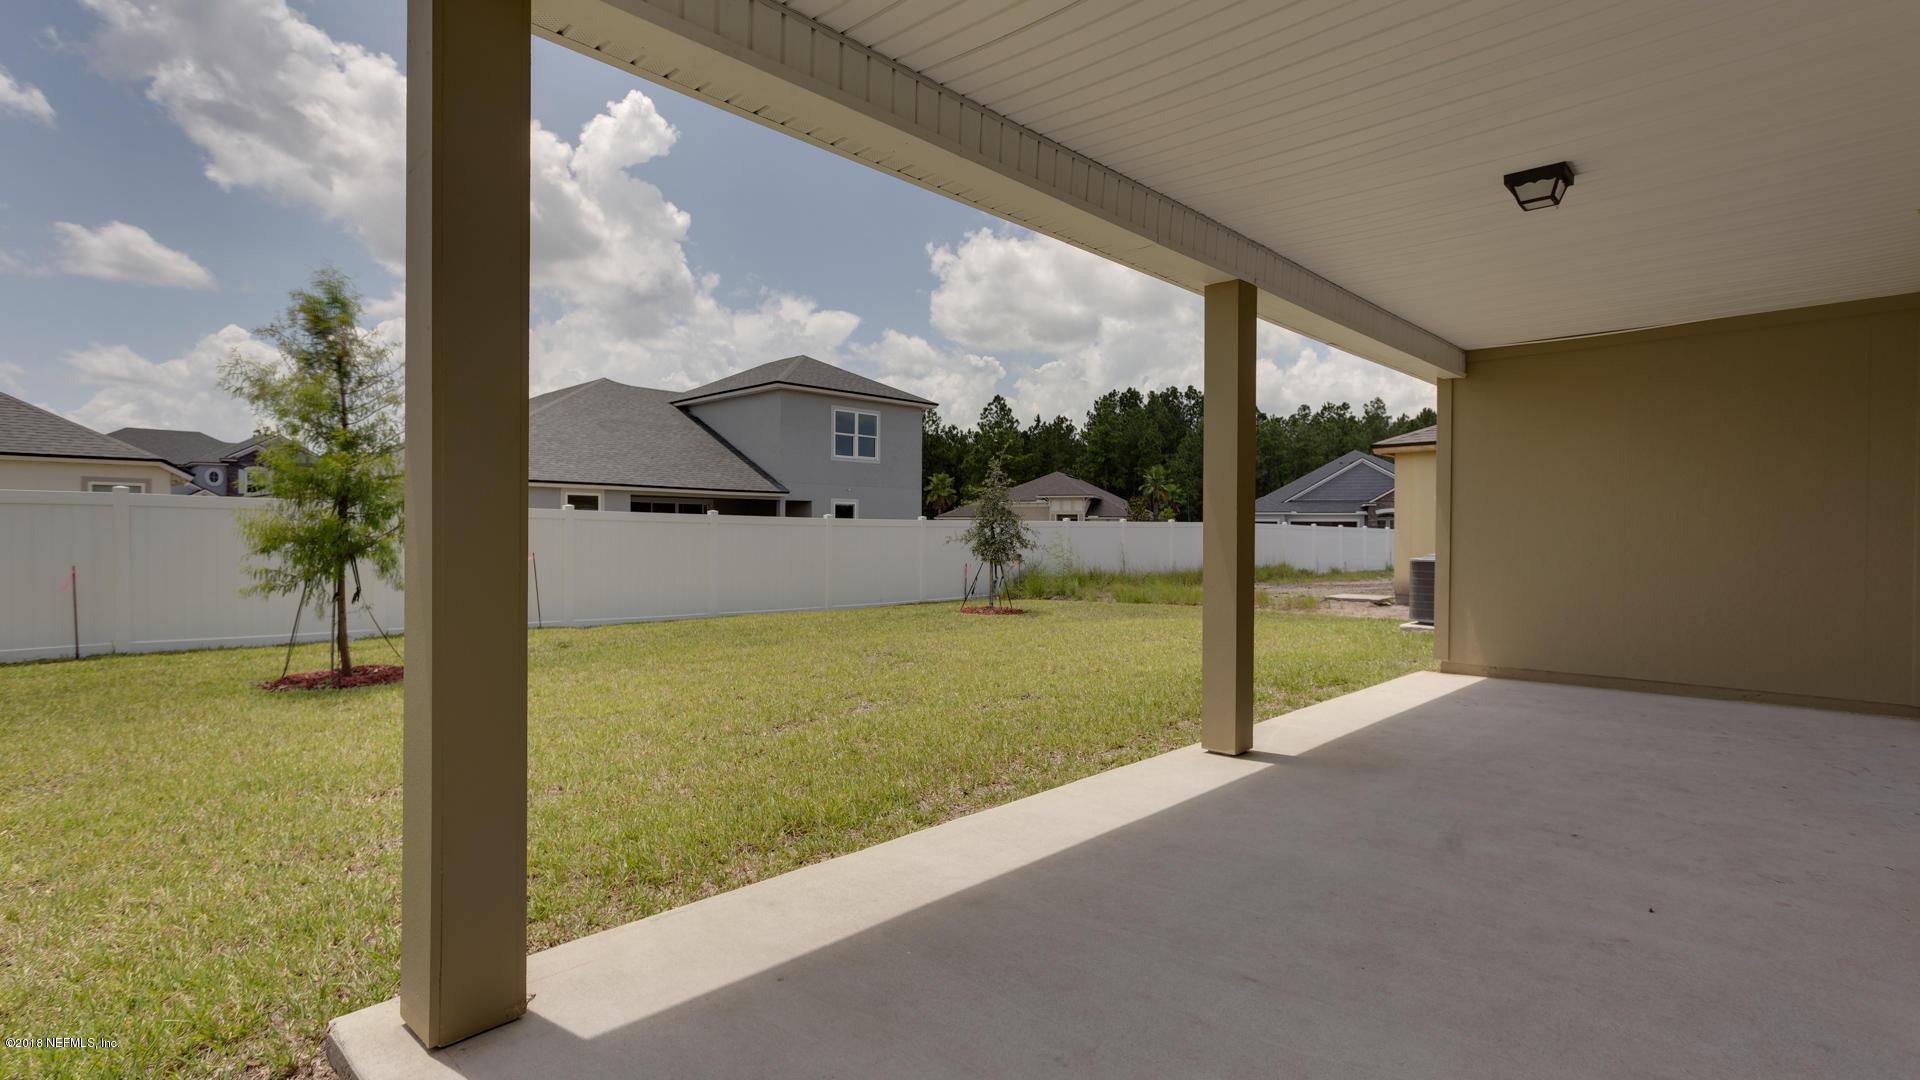 3606 BAXTER ST, JACKSONVILLE, FLORIDA 32222, 3 Bedrooms Bedrooms, ,2 BathroomsBathrooms,Residential - single family,For sale,BAXTER ST,921070